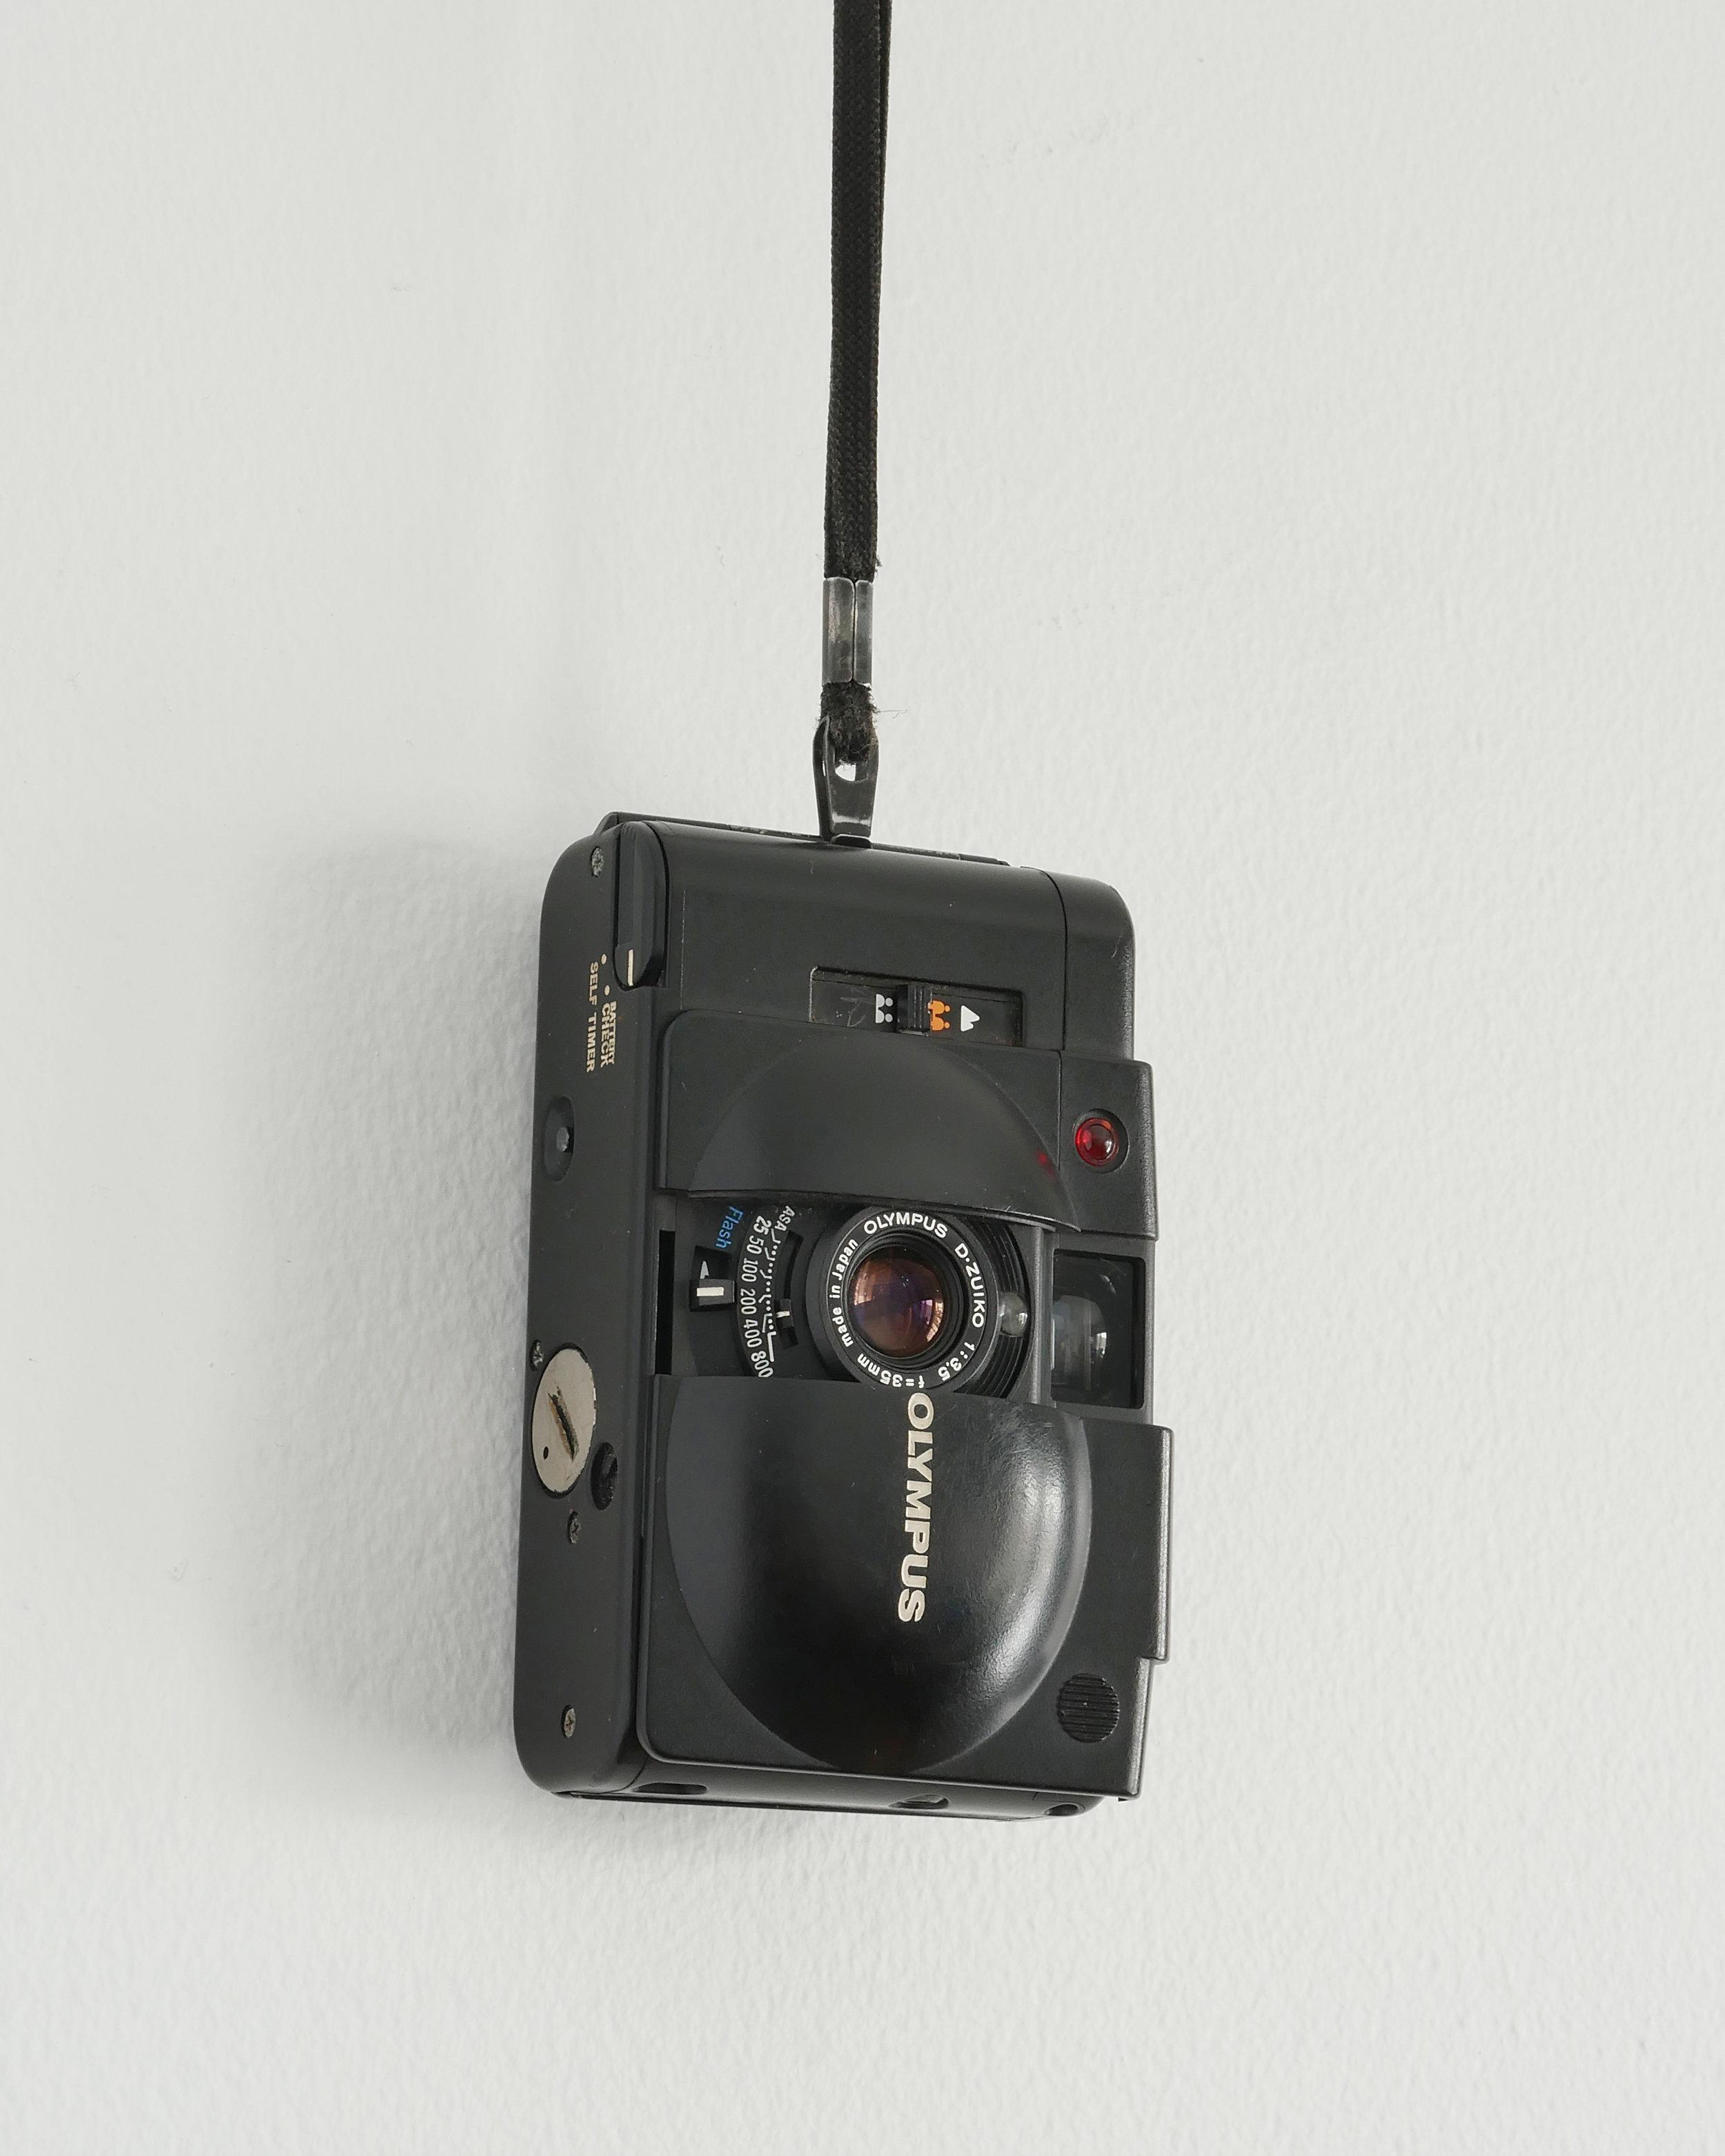 P1140158.JPG